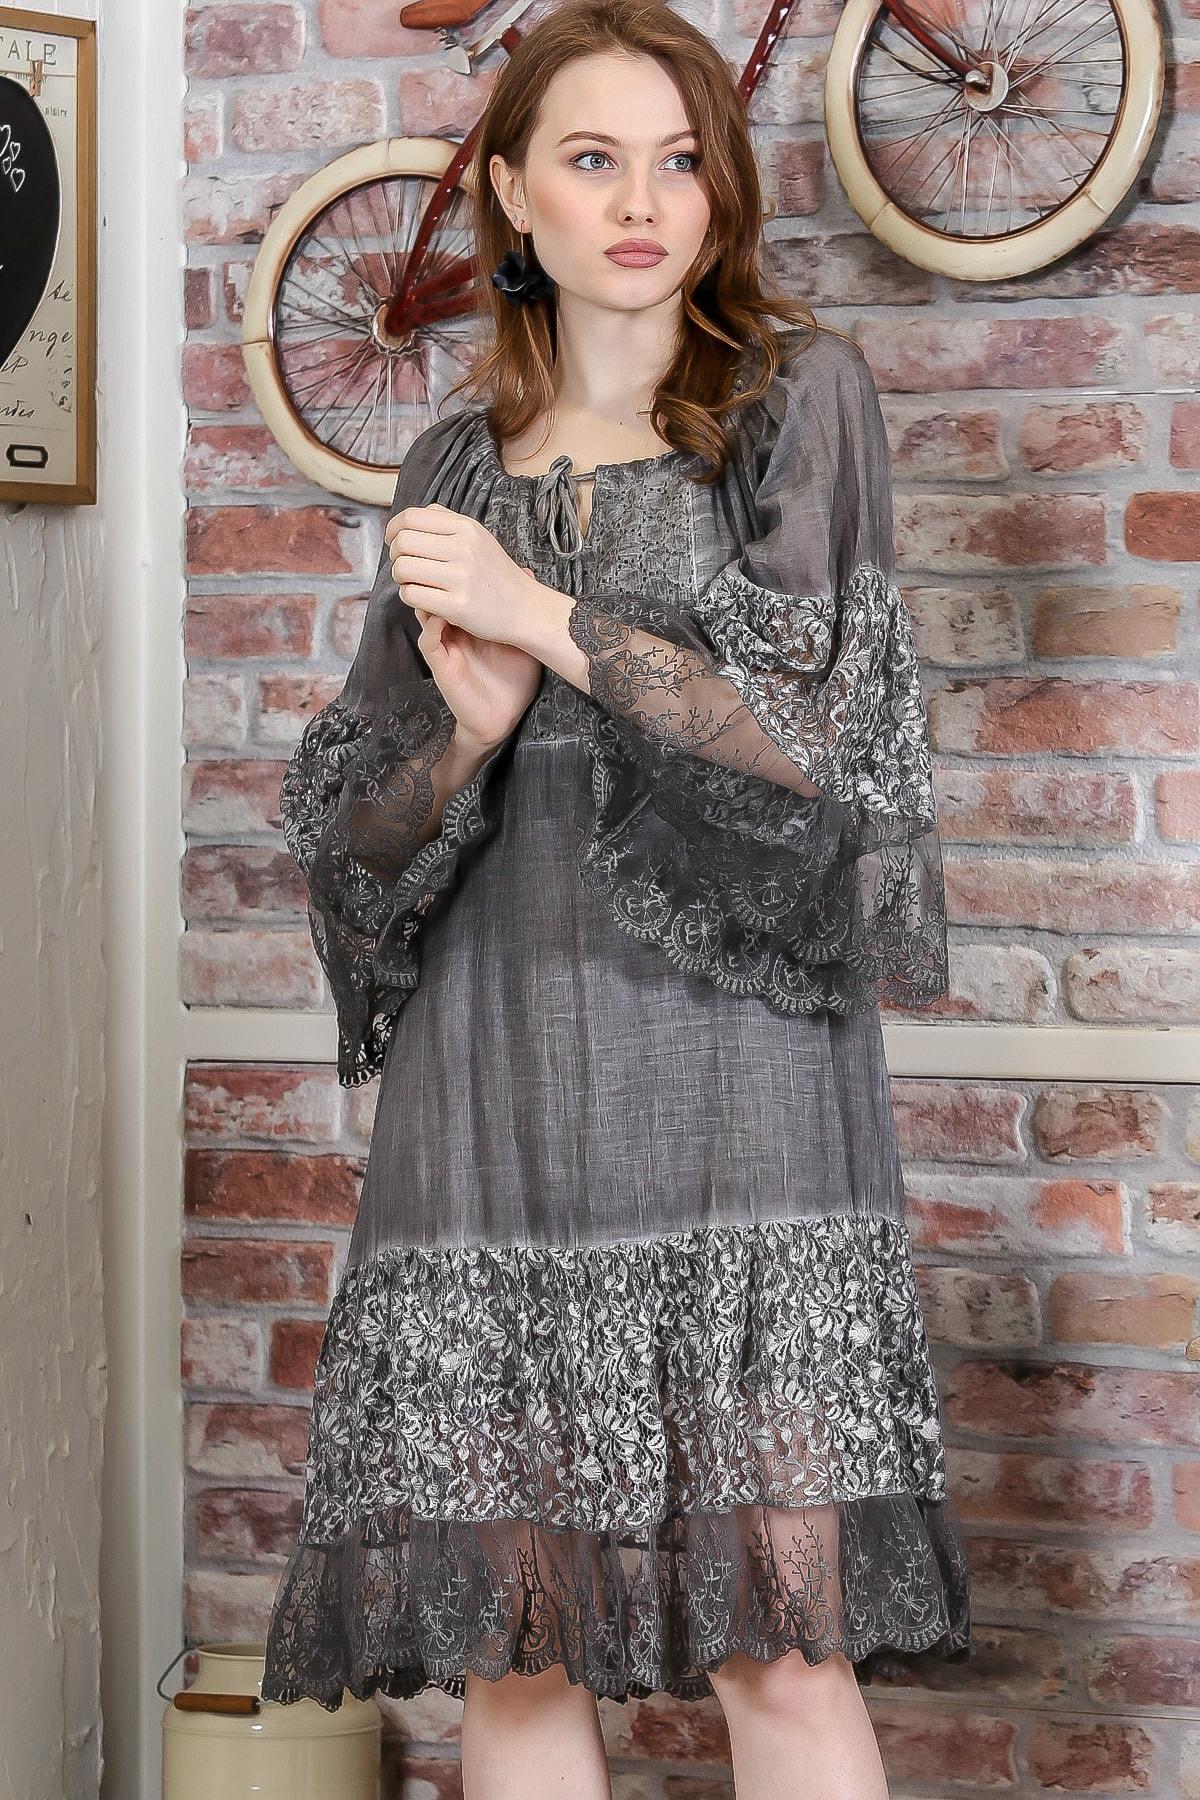 Chiccy Kadın Füme Carmen Yaka İspanyol Kol Dantel Detaylı Astarlı Salaş Midi Elbise M10160000EL95240